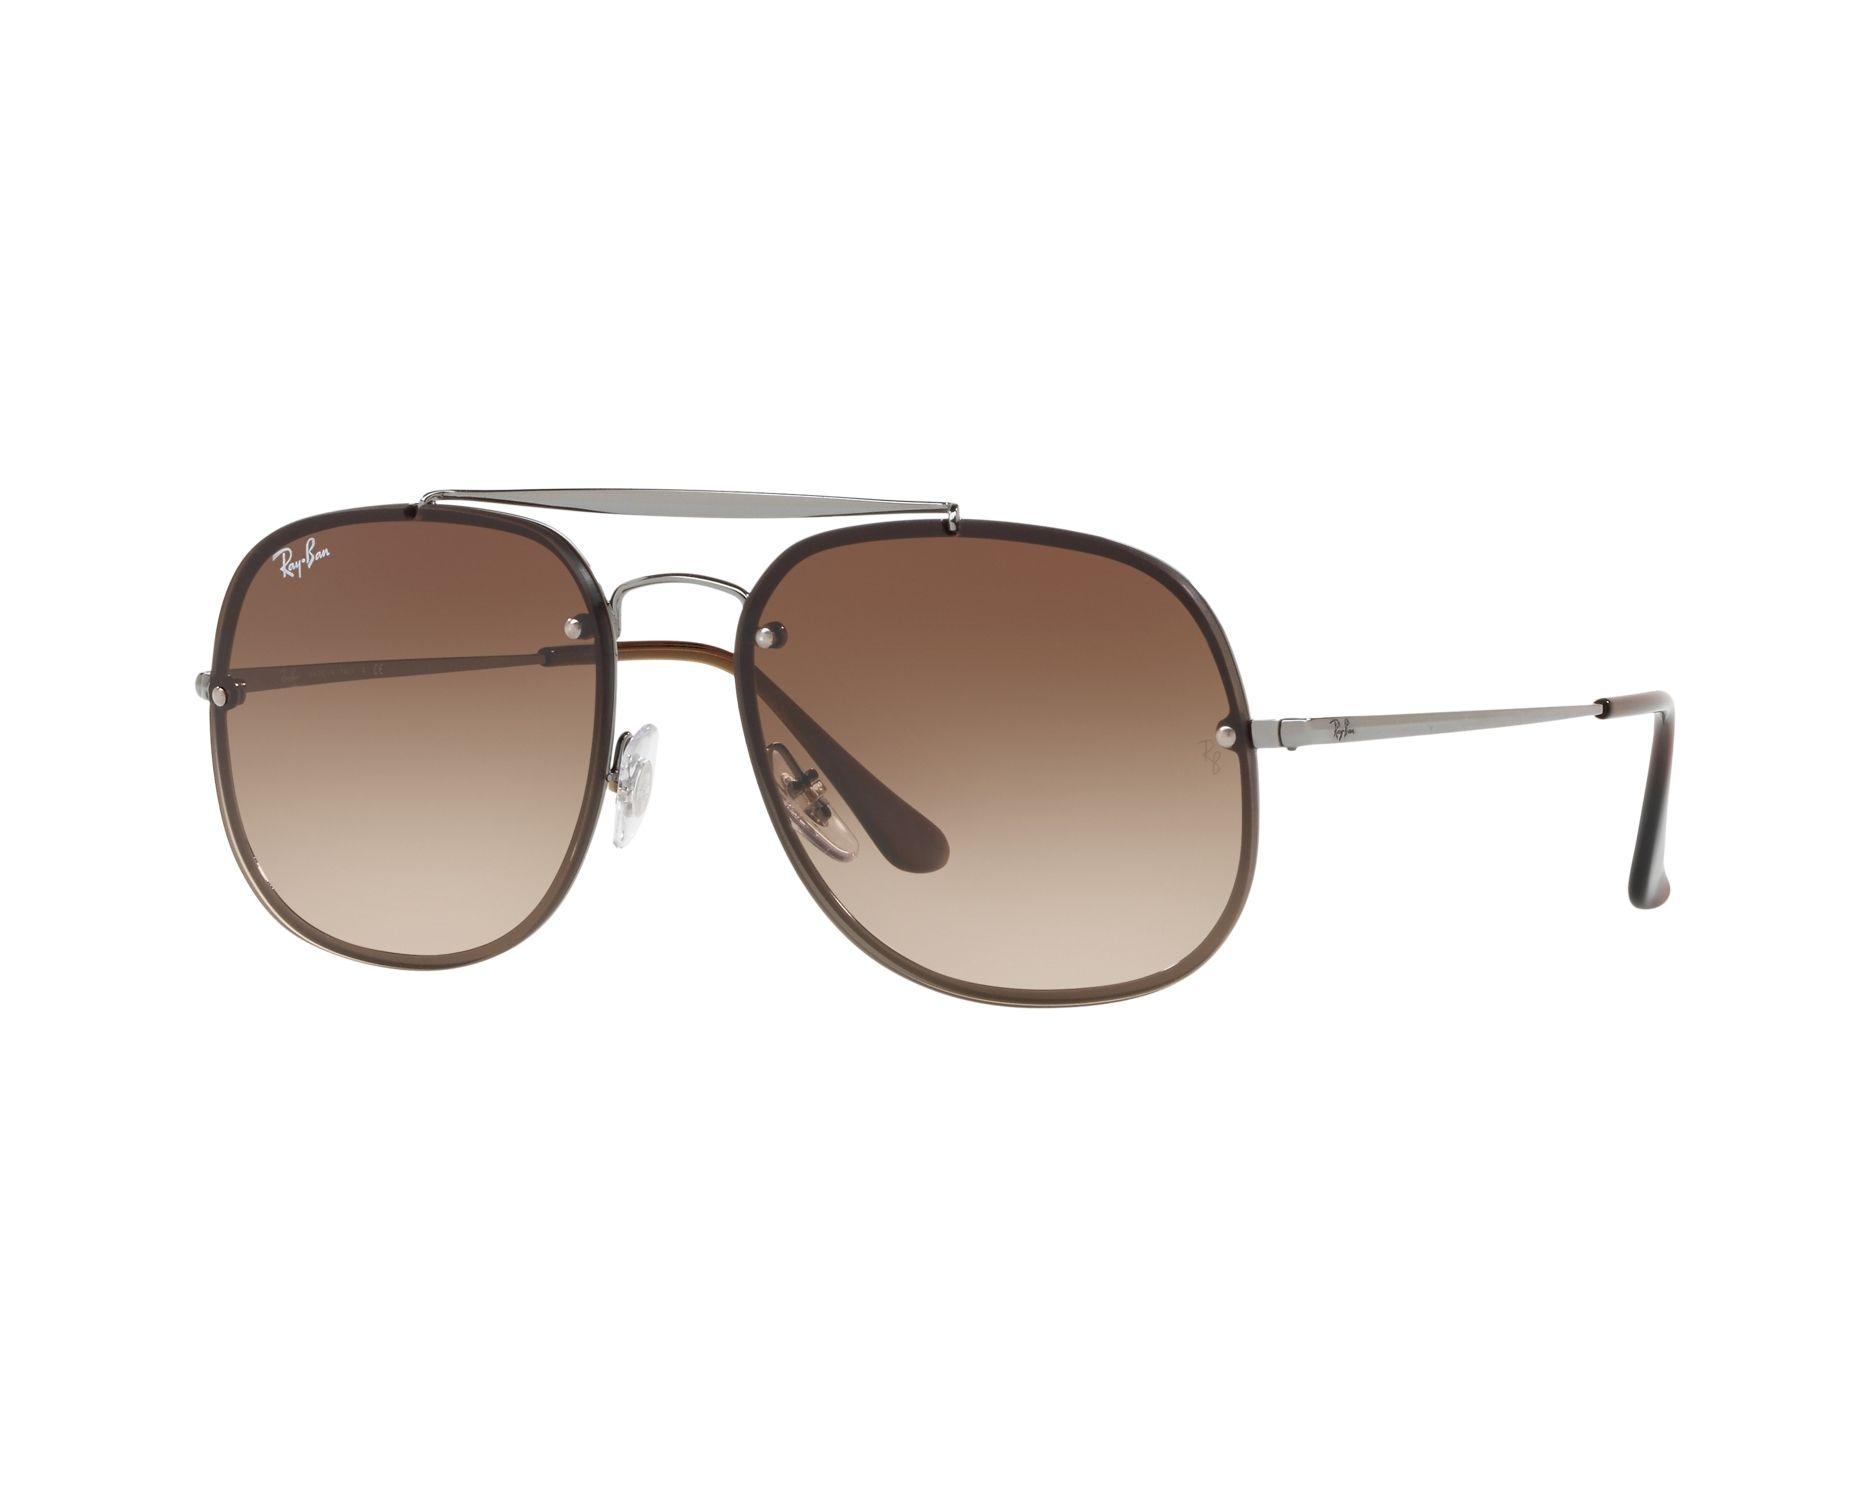 32c4ce55400 Sunglasses Ray-Ban RB-3583-N 004 13 58-16 Gun